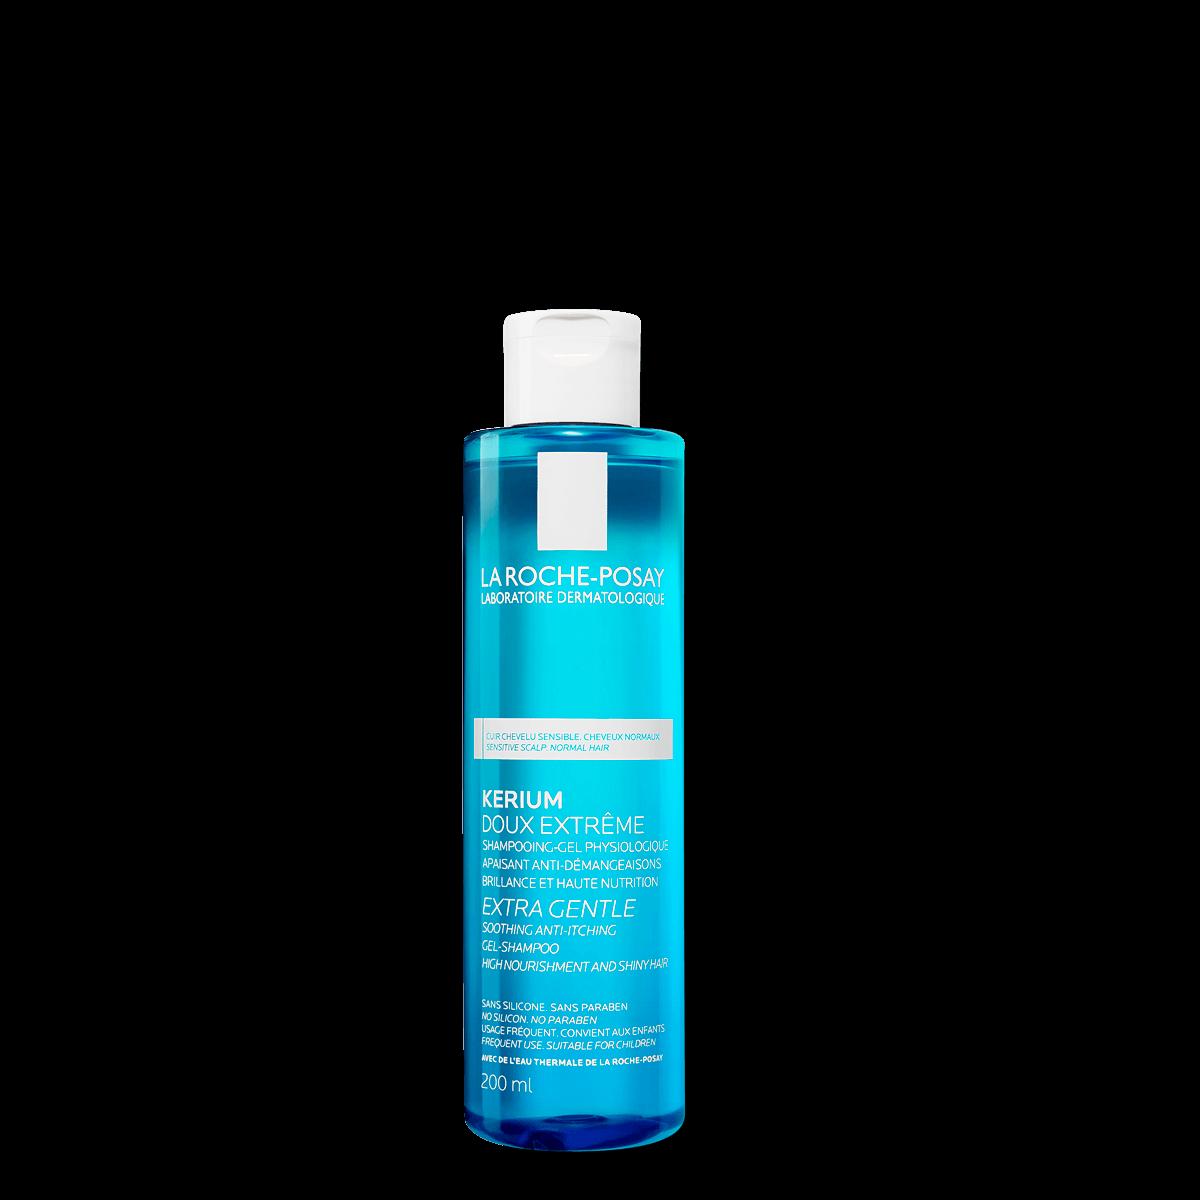 La Roche Posay Tuotesivu Kerium Extra Gentle Gel Shampoo 200ml 33378